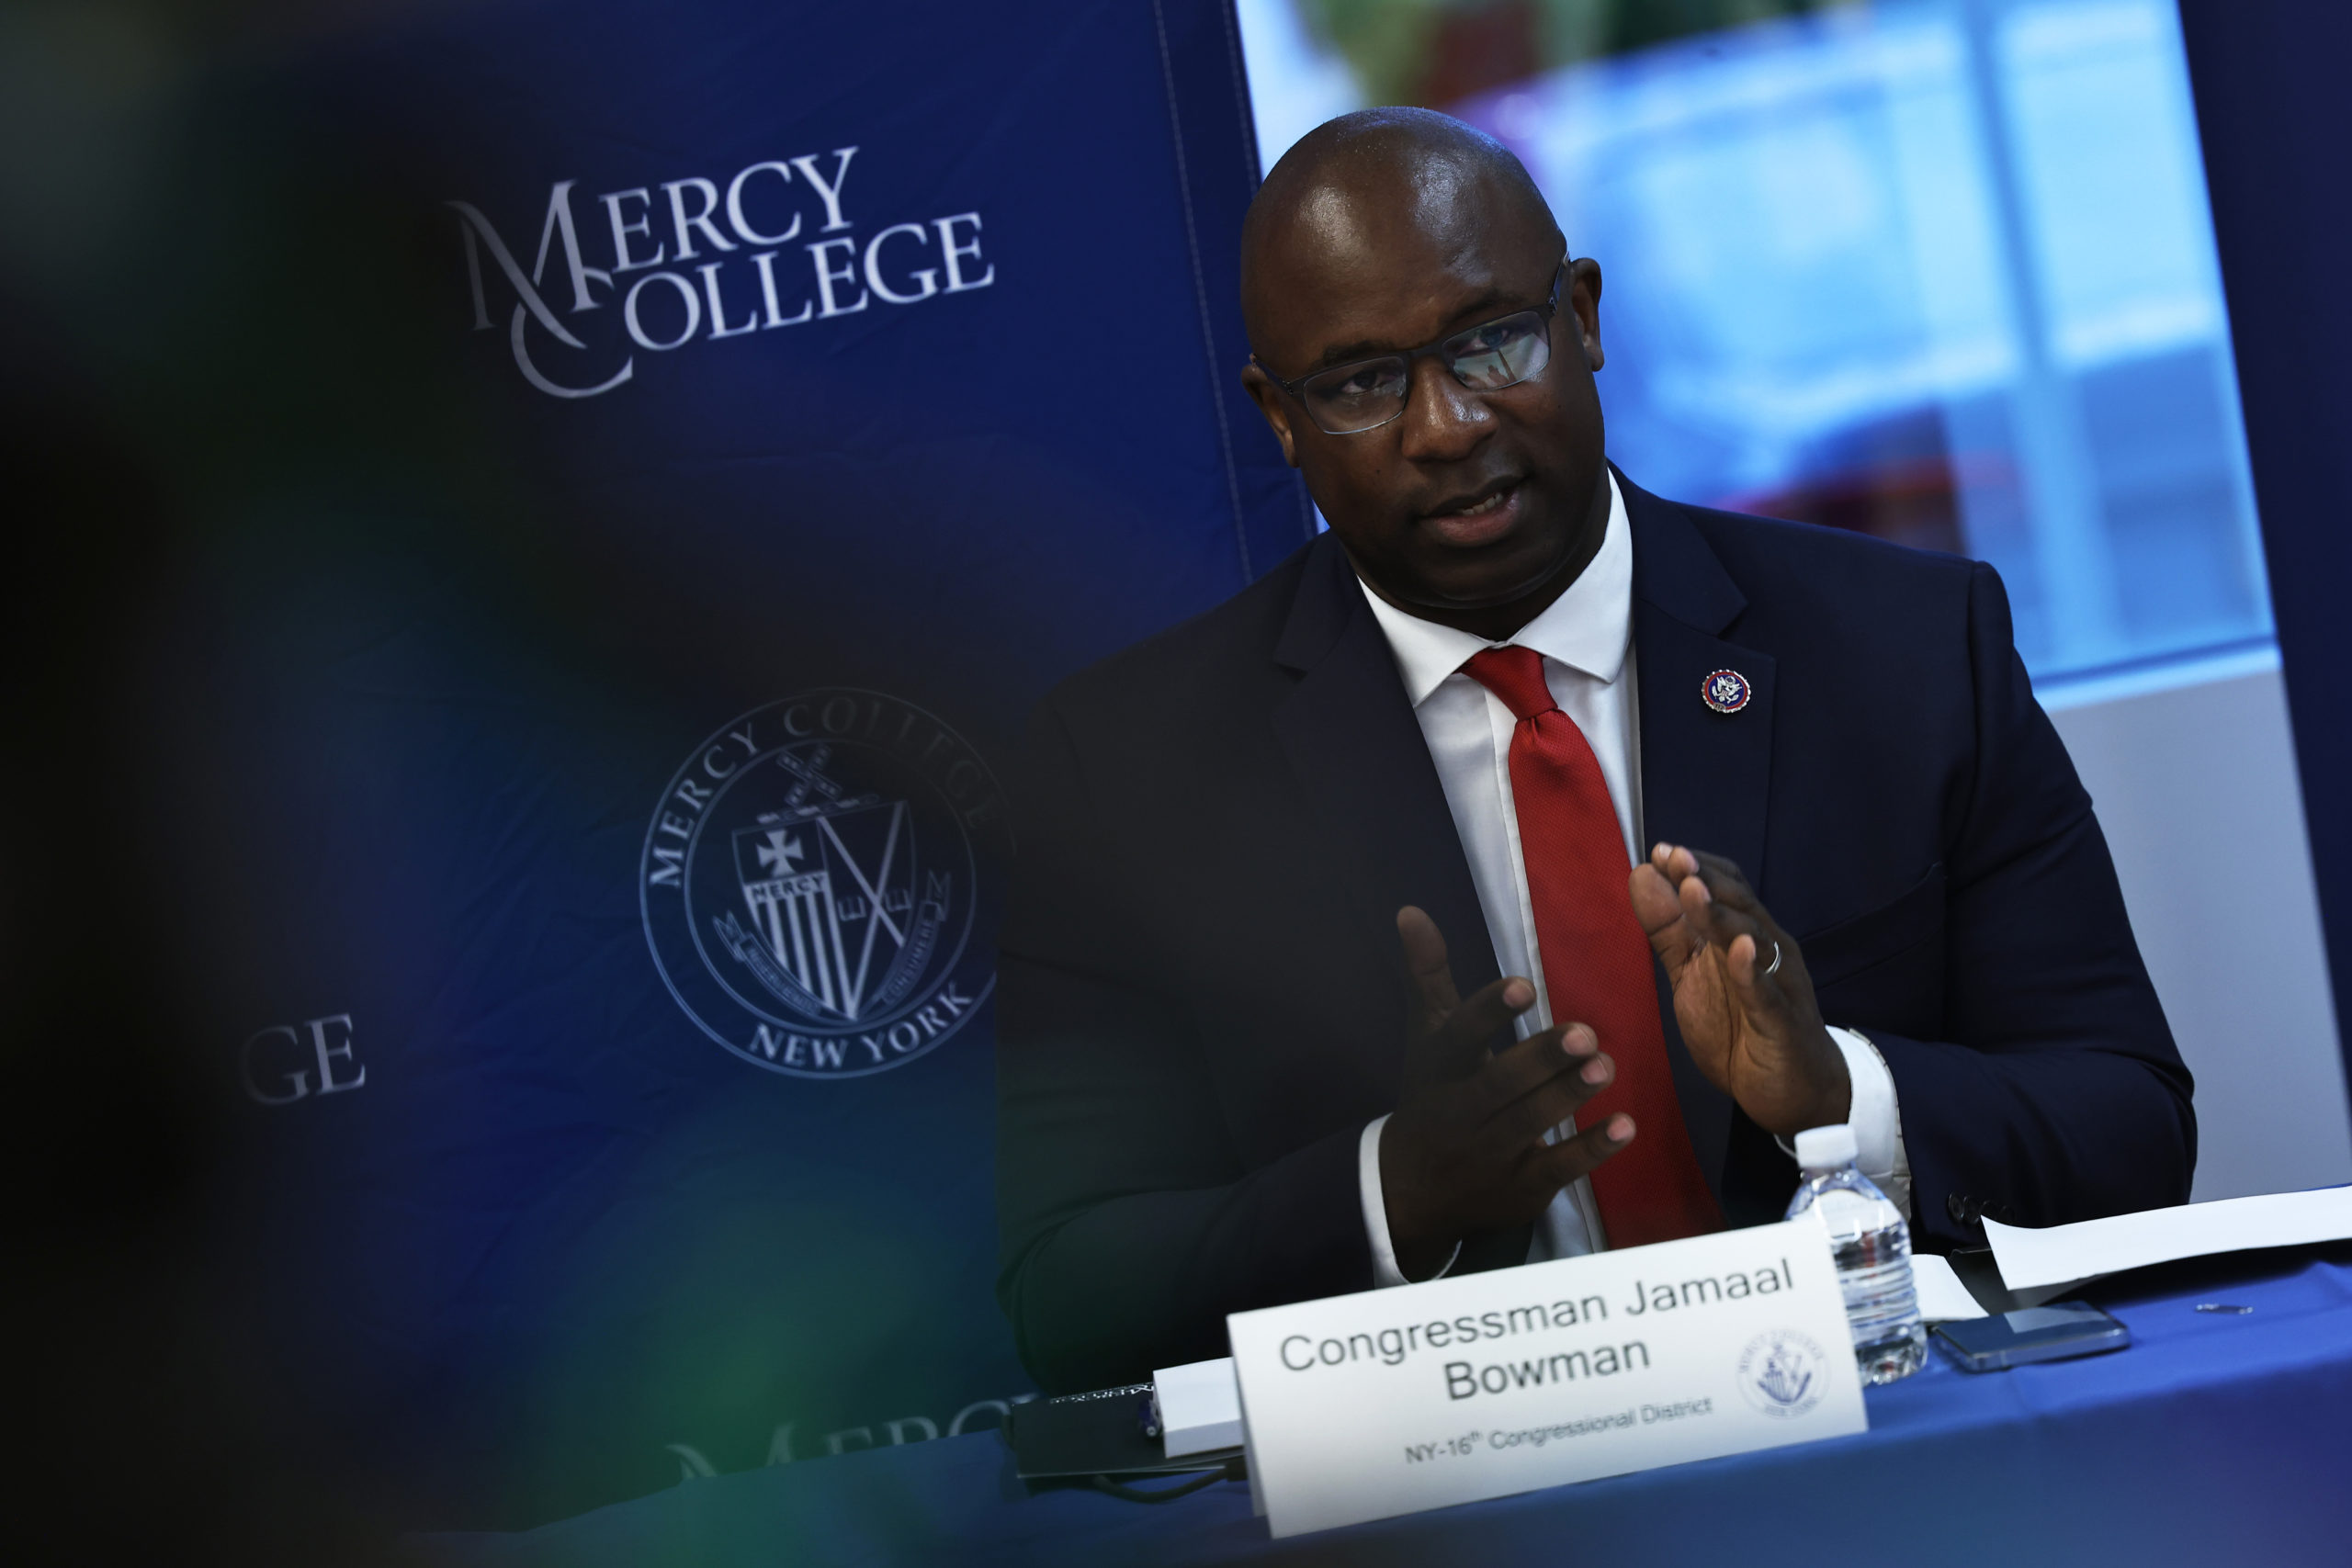 Education Secretary Cardona Visits Mercy College In The Bronx